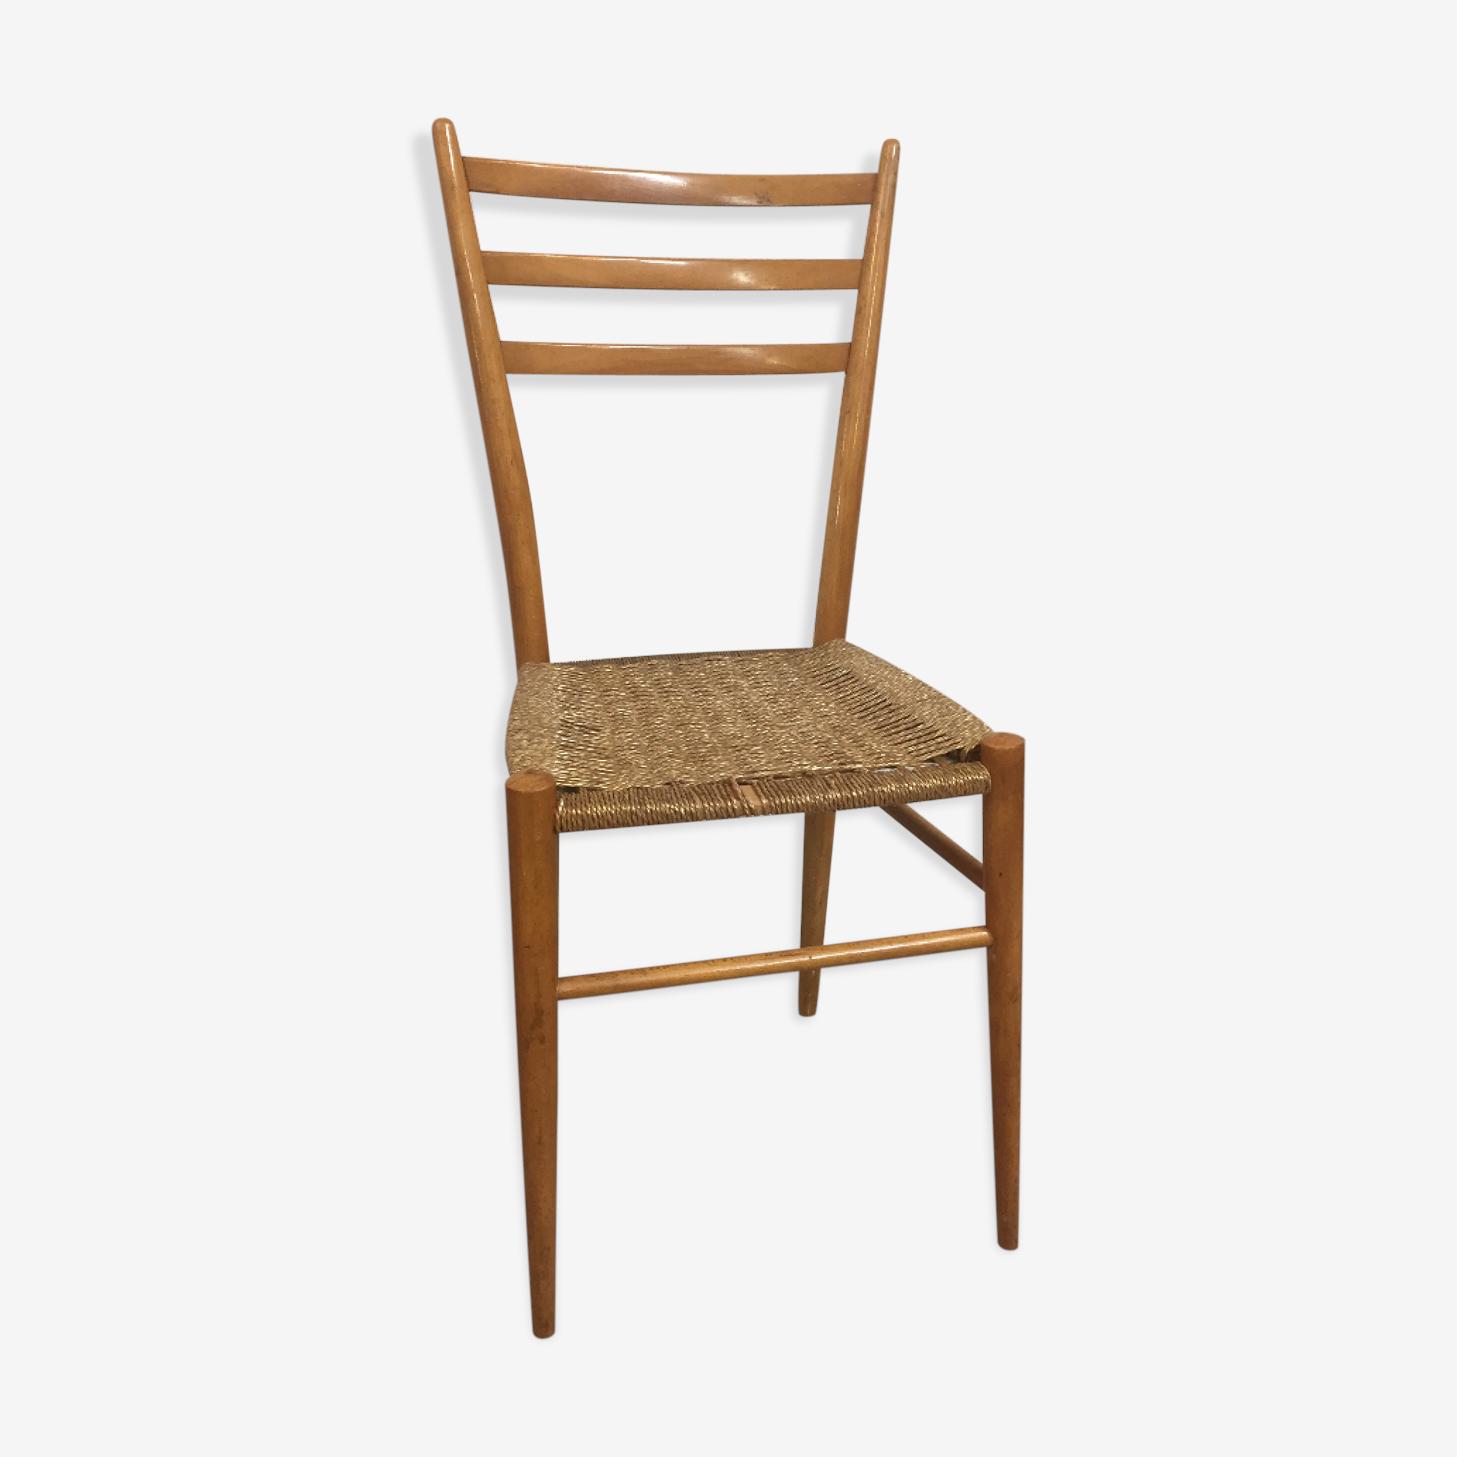 Chair Italian vintage, 1950